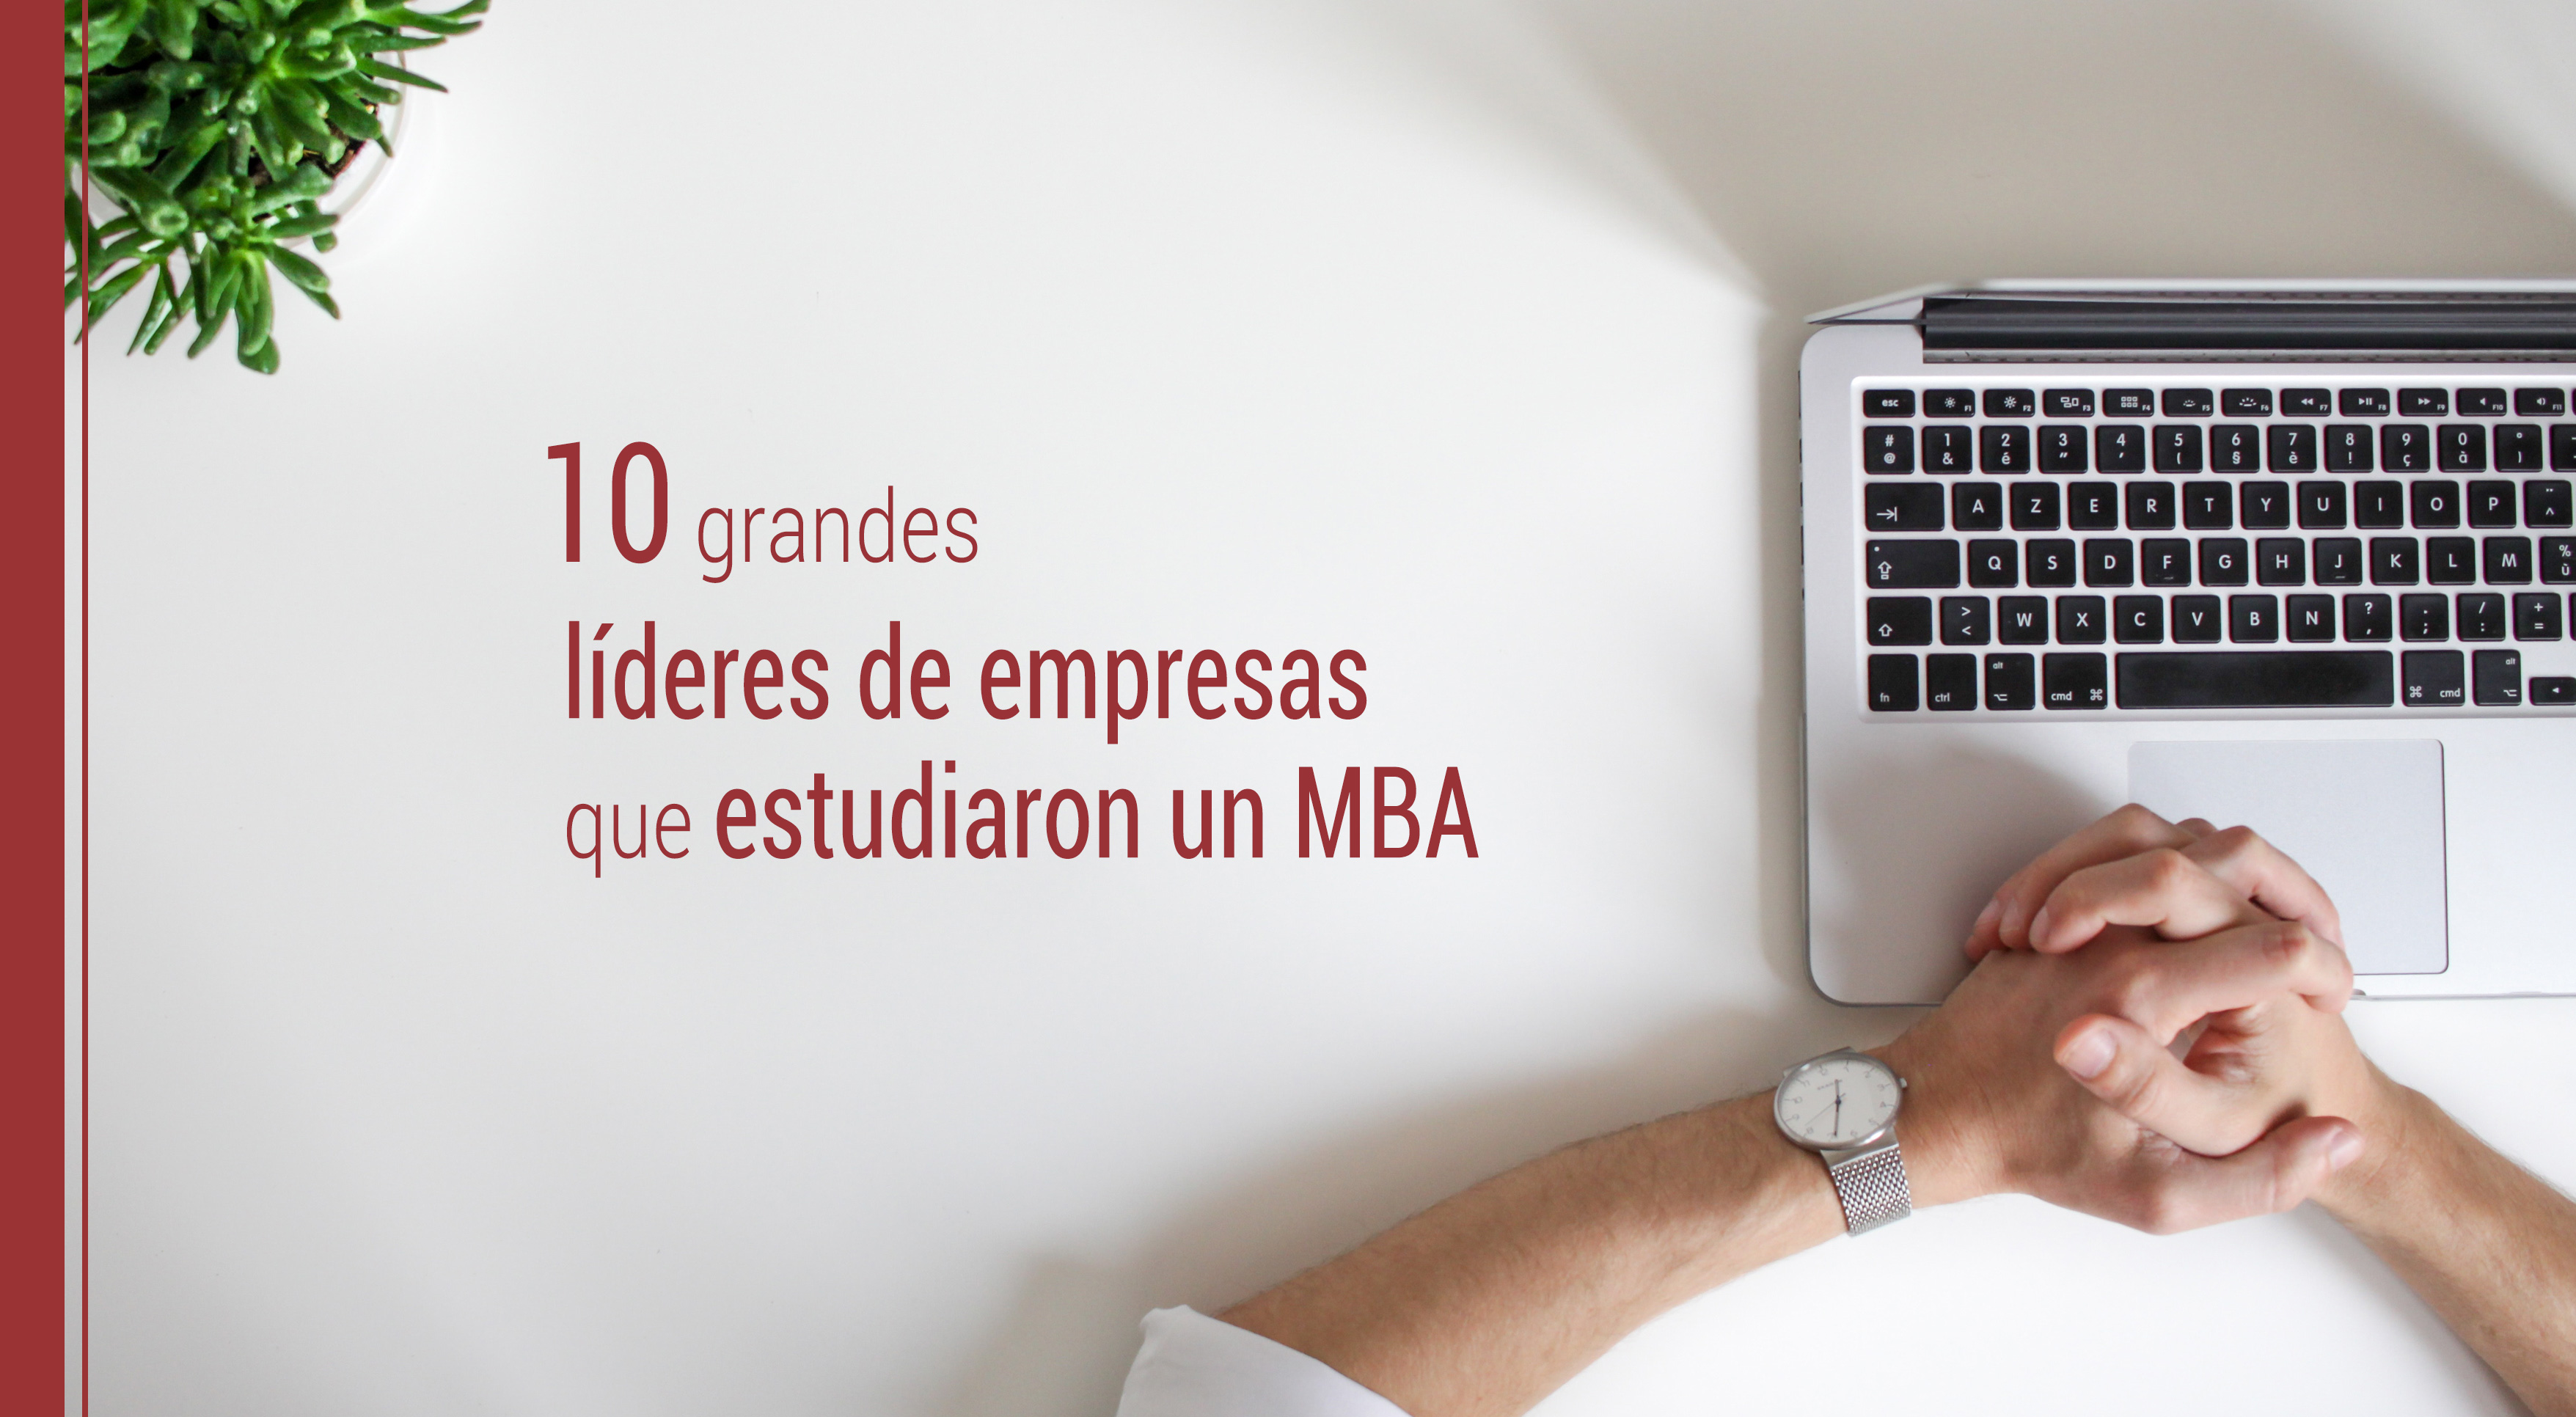 10-lideres-empresas-estudiaron-mba 10 grandes líderes de empresas que estudiaron un MBA